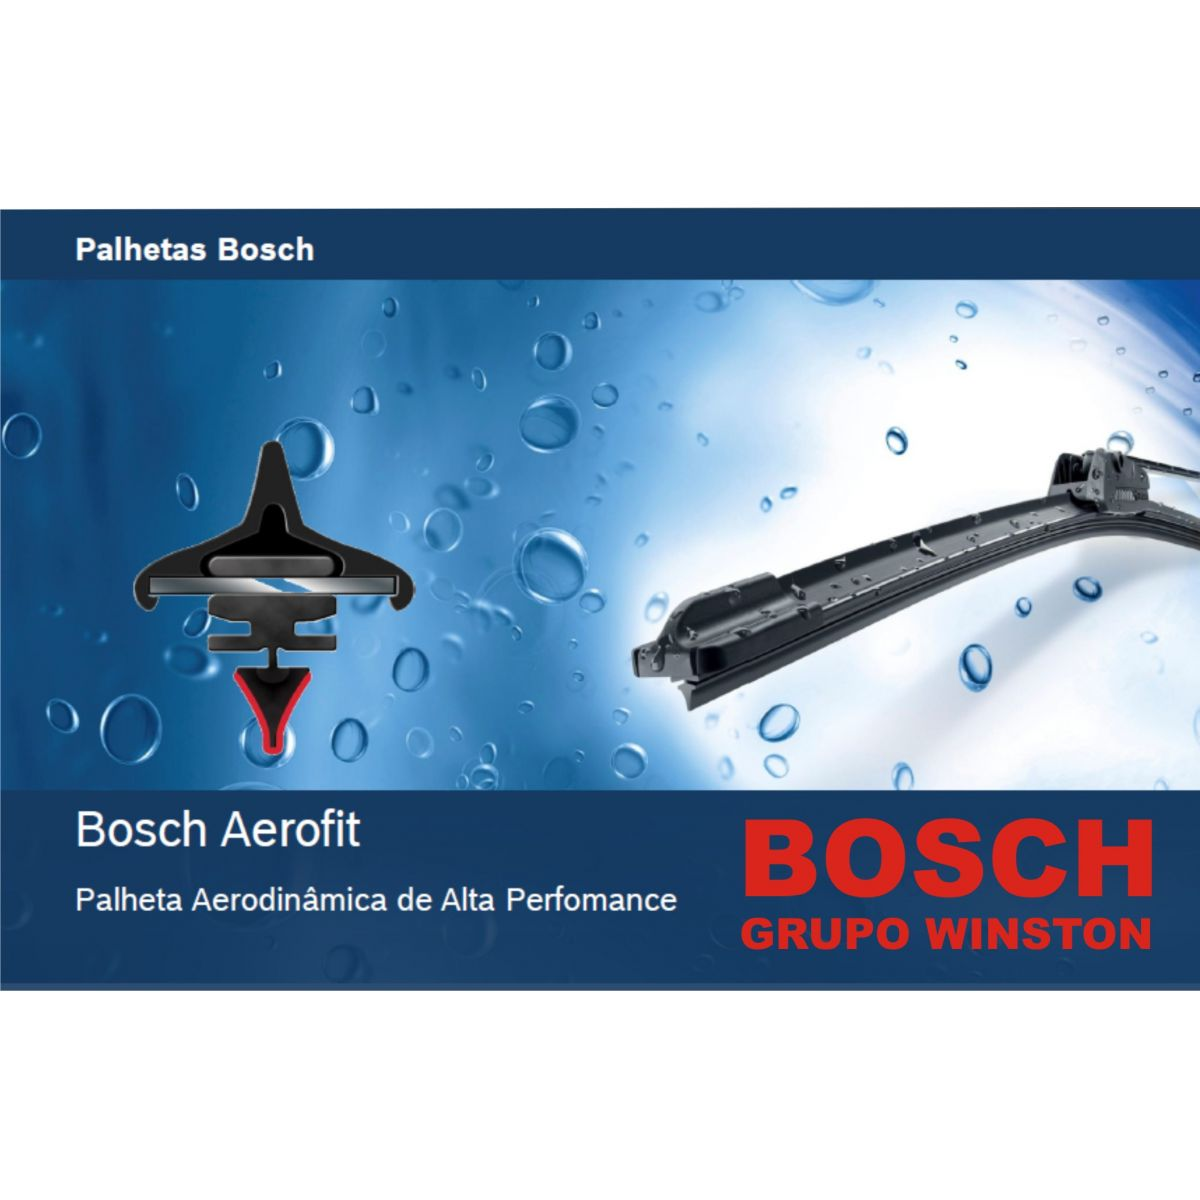 Palheta Bosch Aerofit Limpador de para brisa Bosch LEXUS LS 430